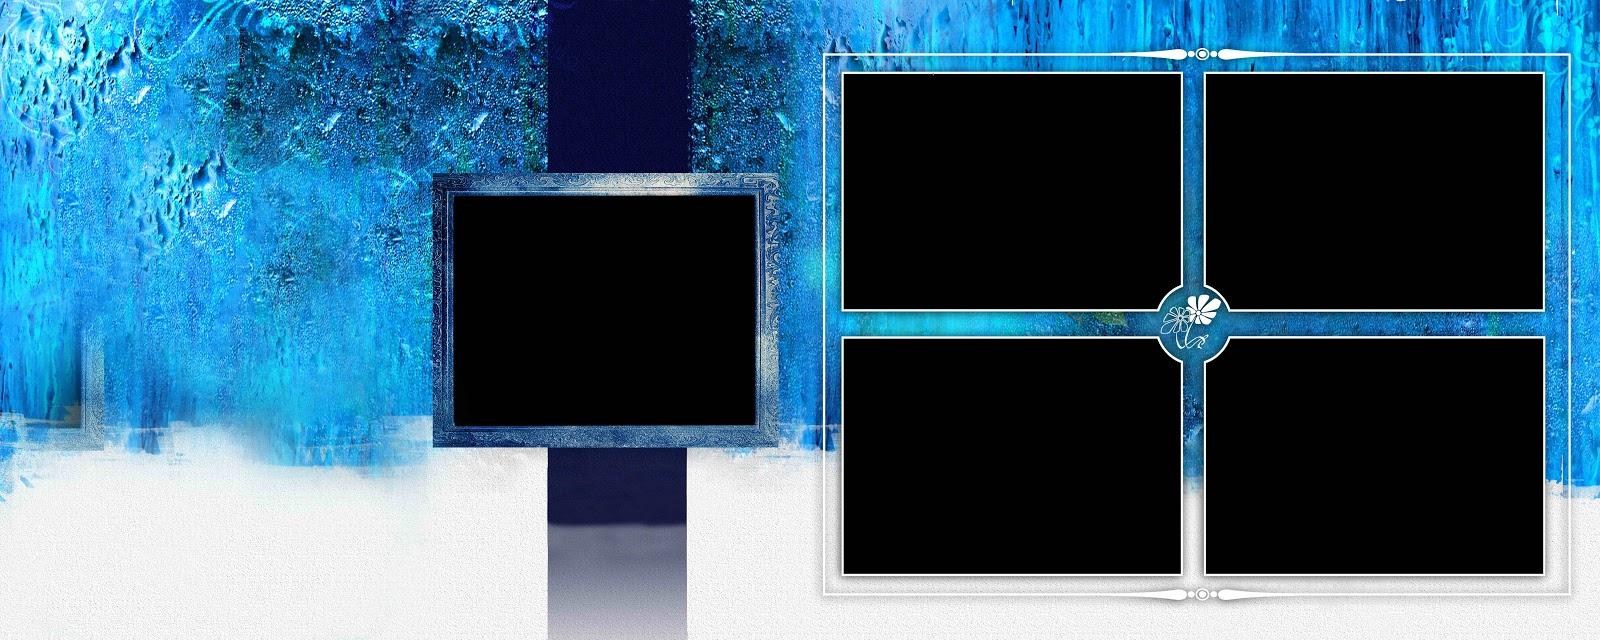 Adobe Photoshop Psd Templates Gold Design Elements